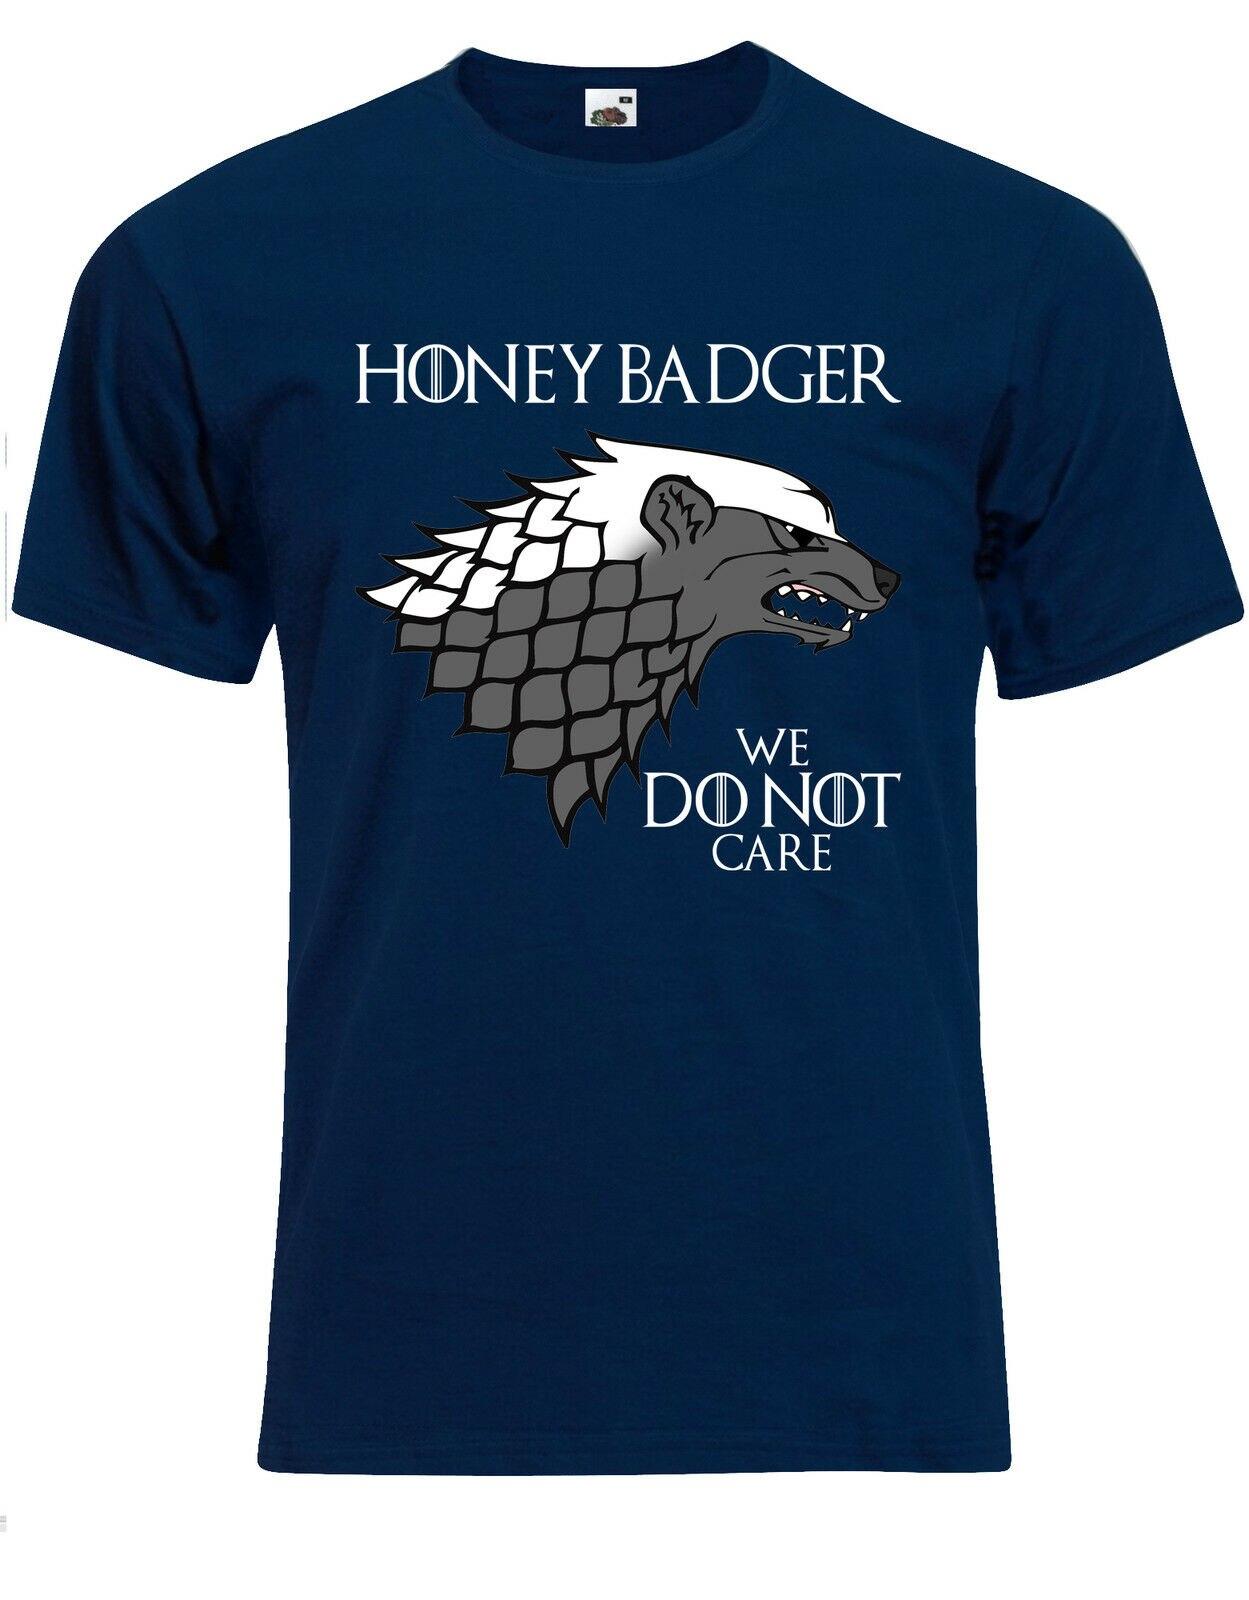 House Honey Badger Got Parody (Clean) Dont Care Mens Tshirt Tee Top